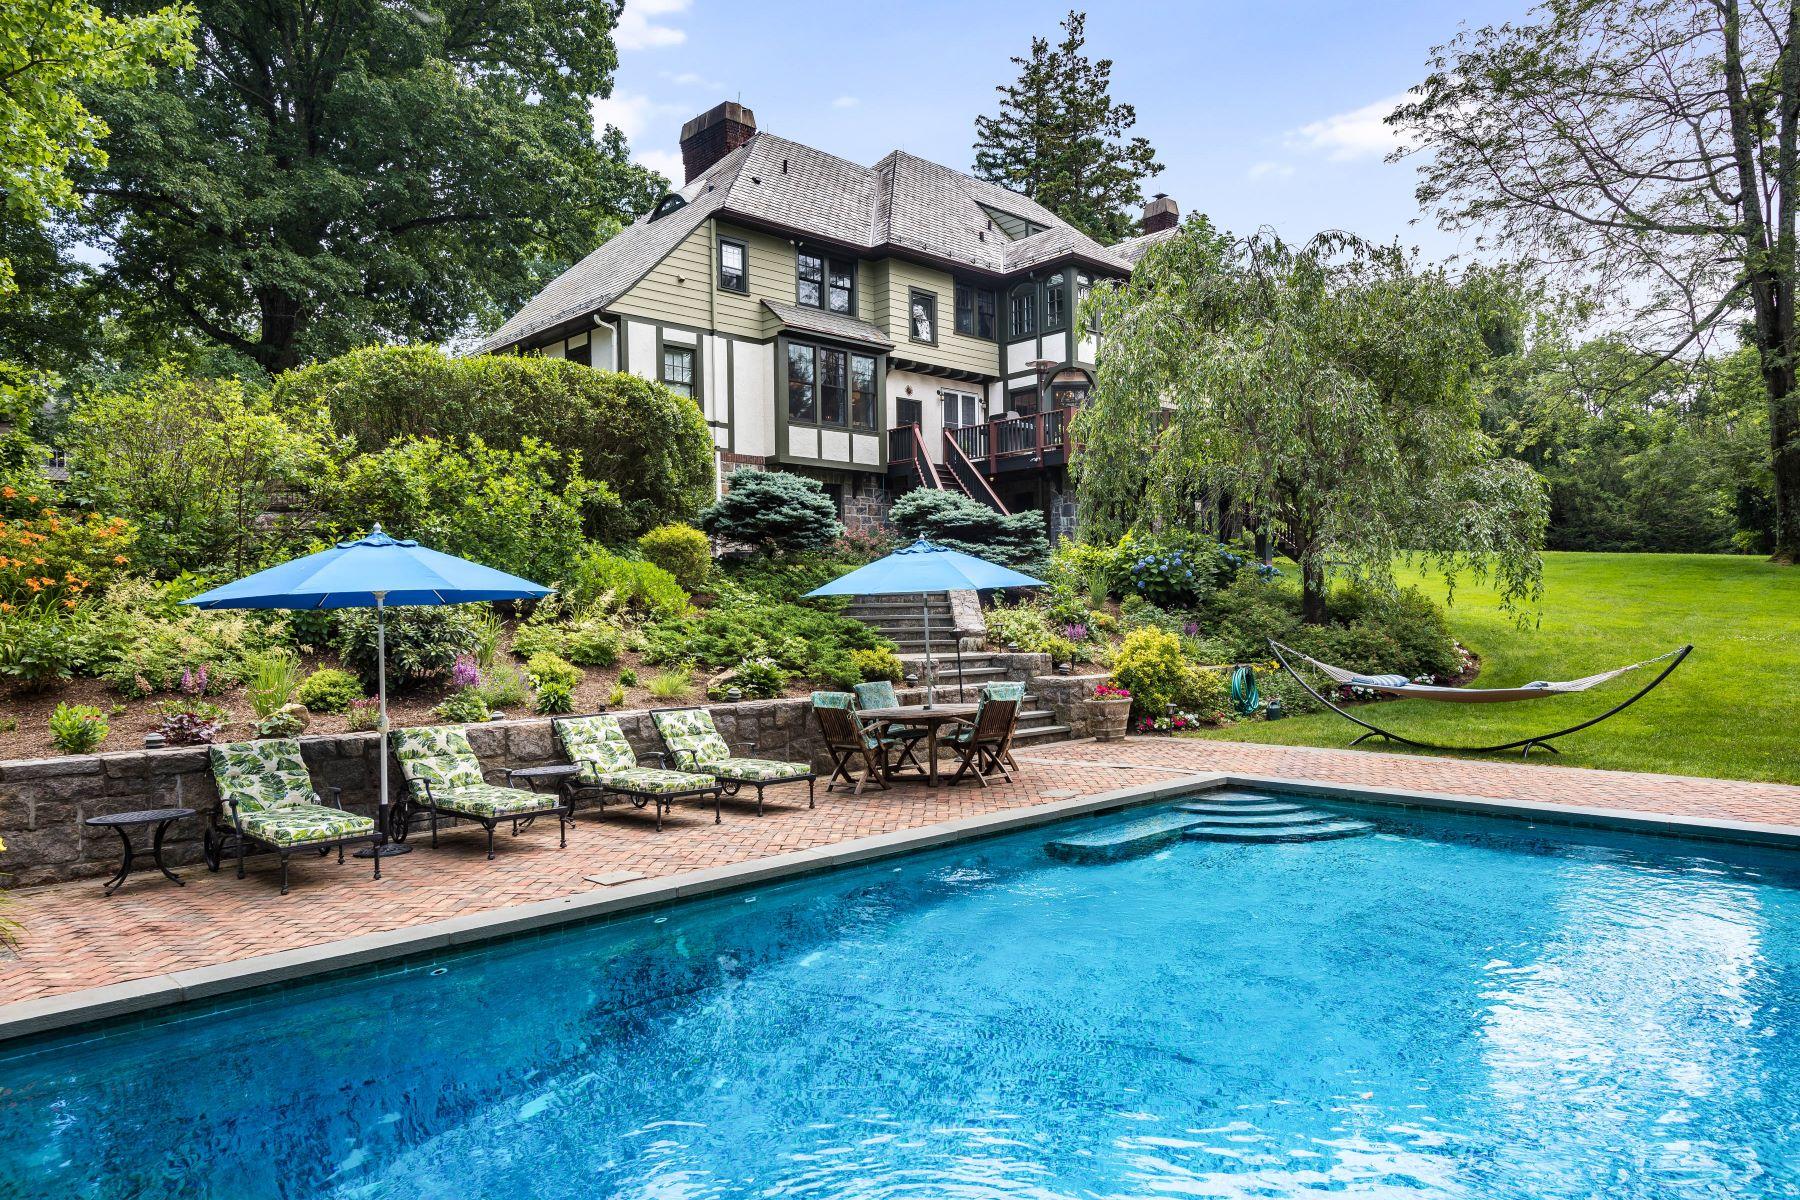 Single Family Homes for Sale at 97 Fargo Lane Irvington, New York 10533 United States